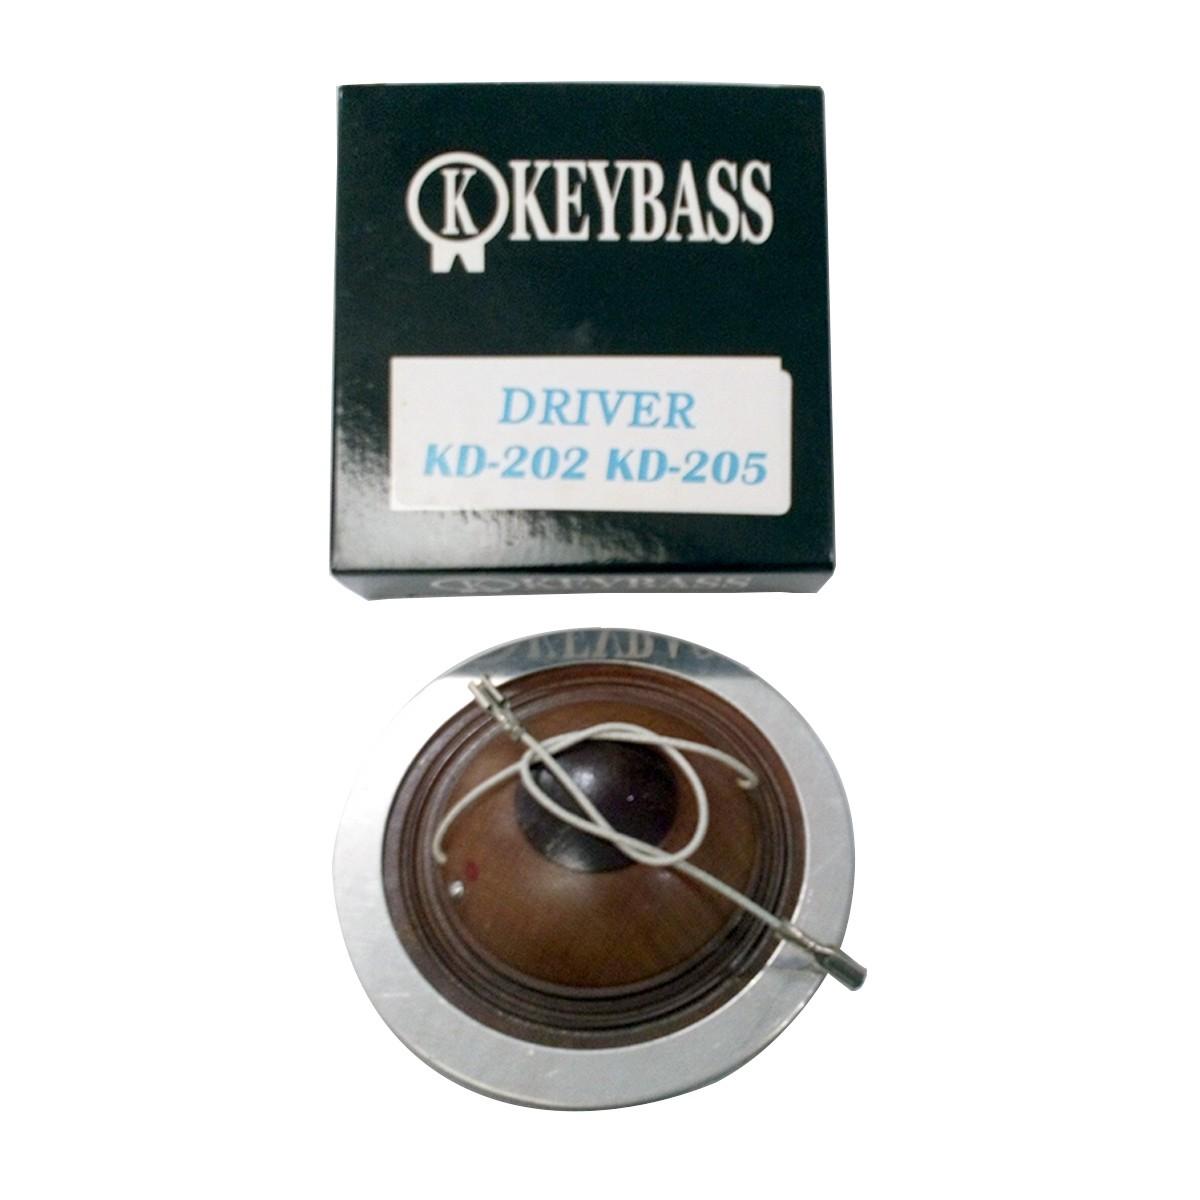 Reparo RKD205 p/ Driver Keybass KD 101 110 202 205 ECO